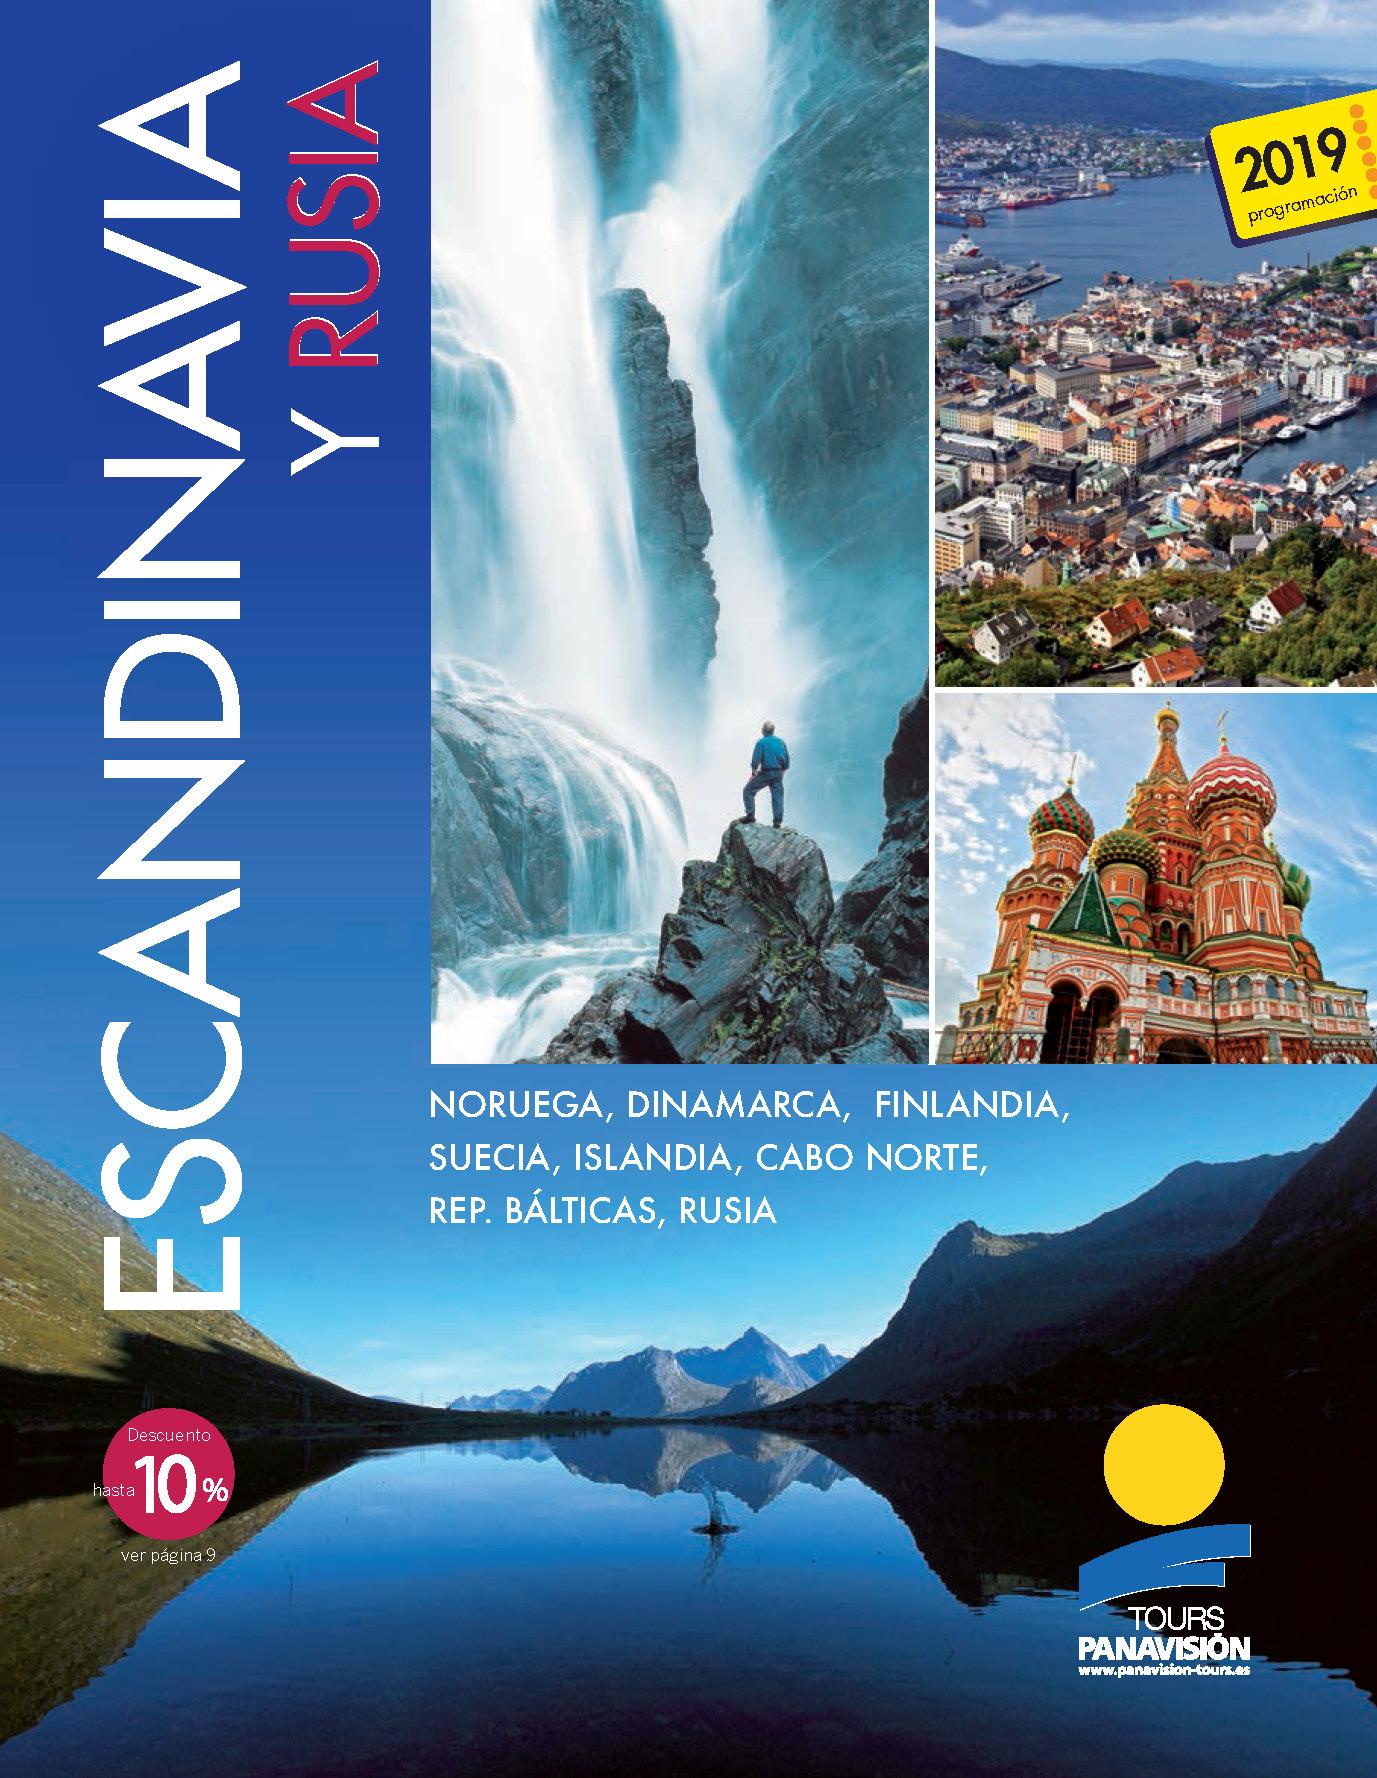 Catalogo Panavision Tours Escandinavia y Rusia 2019 FE9